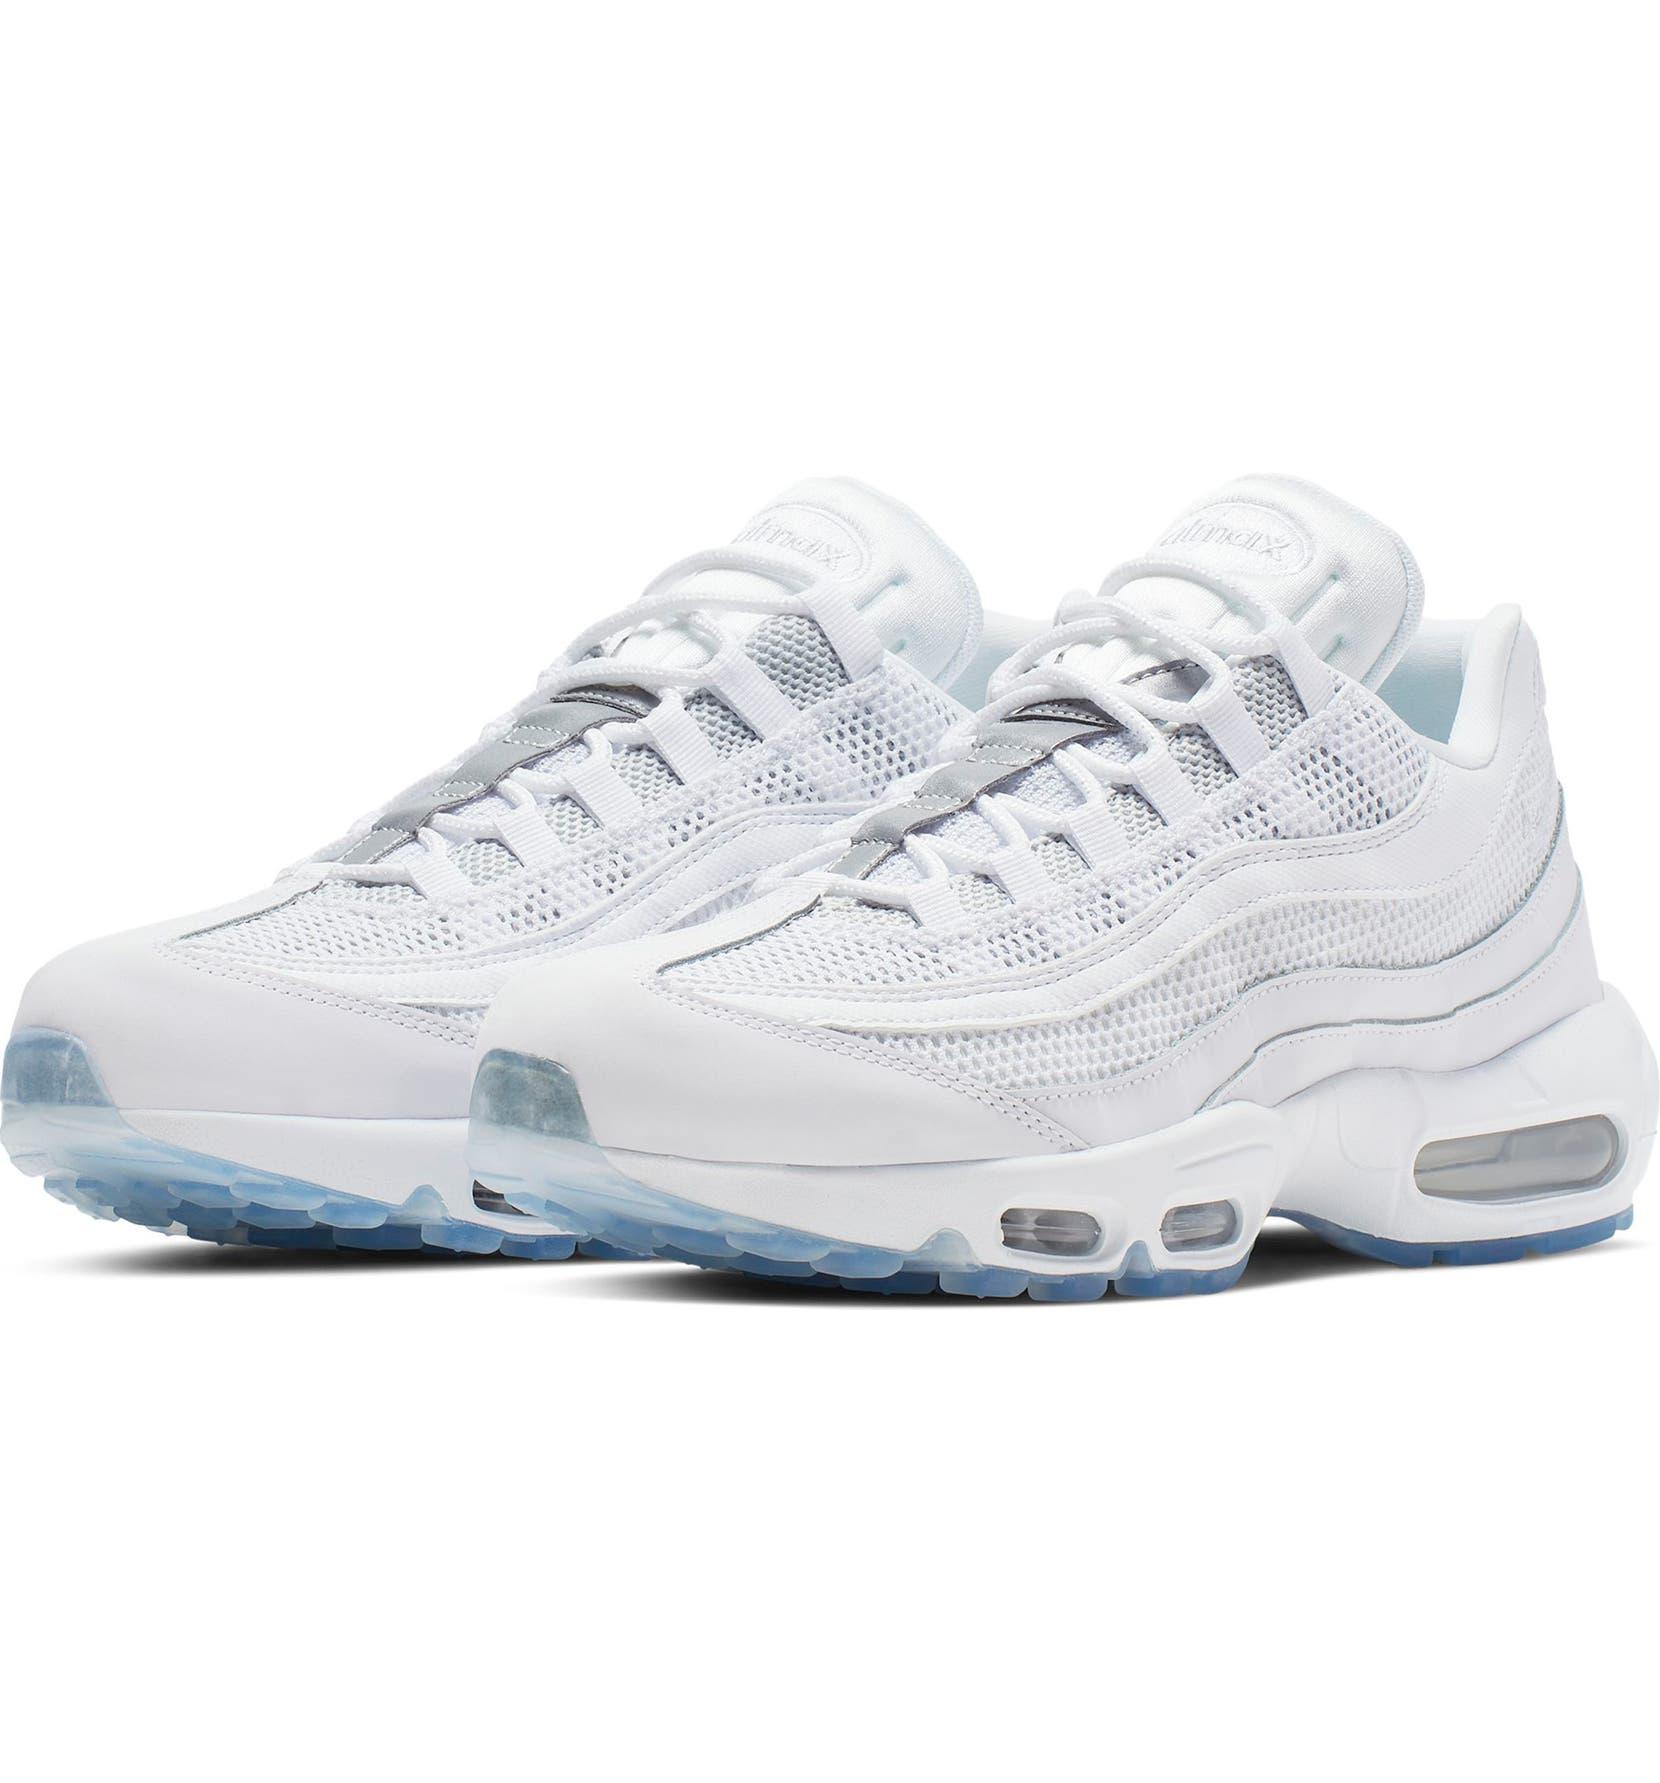 separation shoes 1261e 76a05 Air Max 95 Essential Sneaker